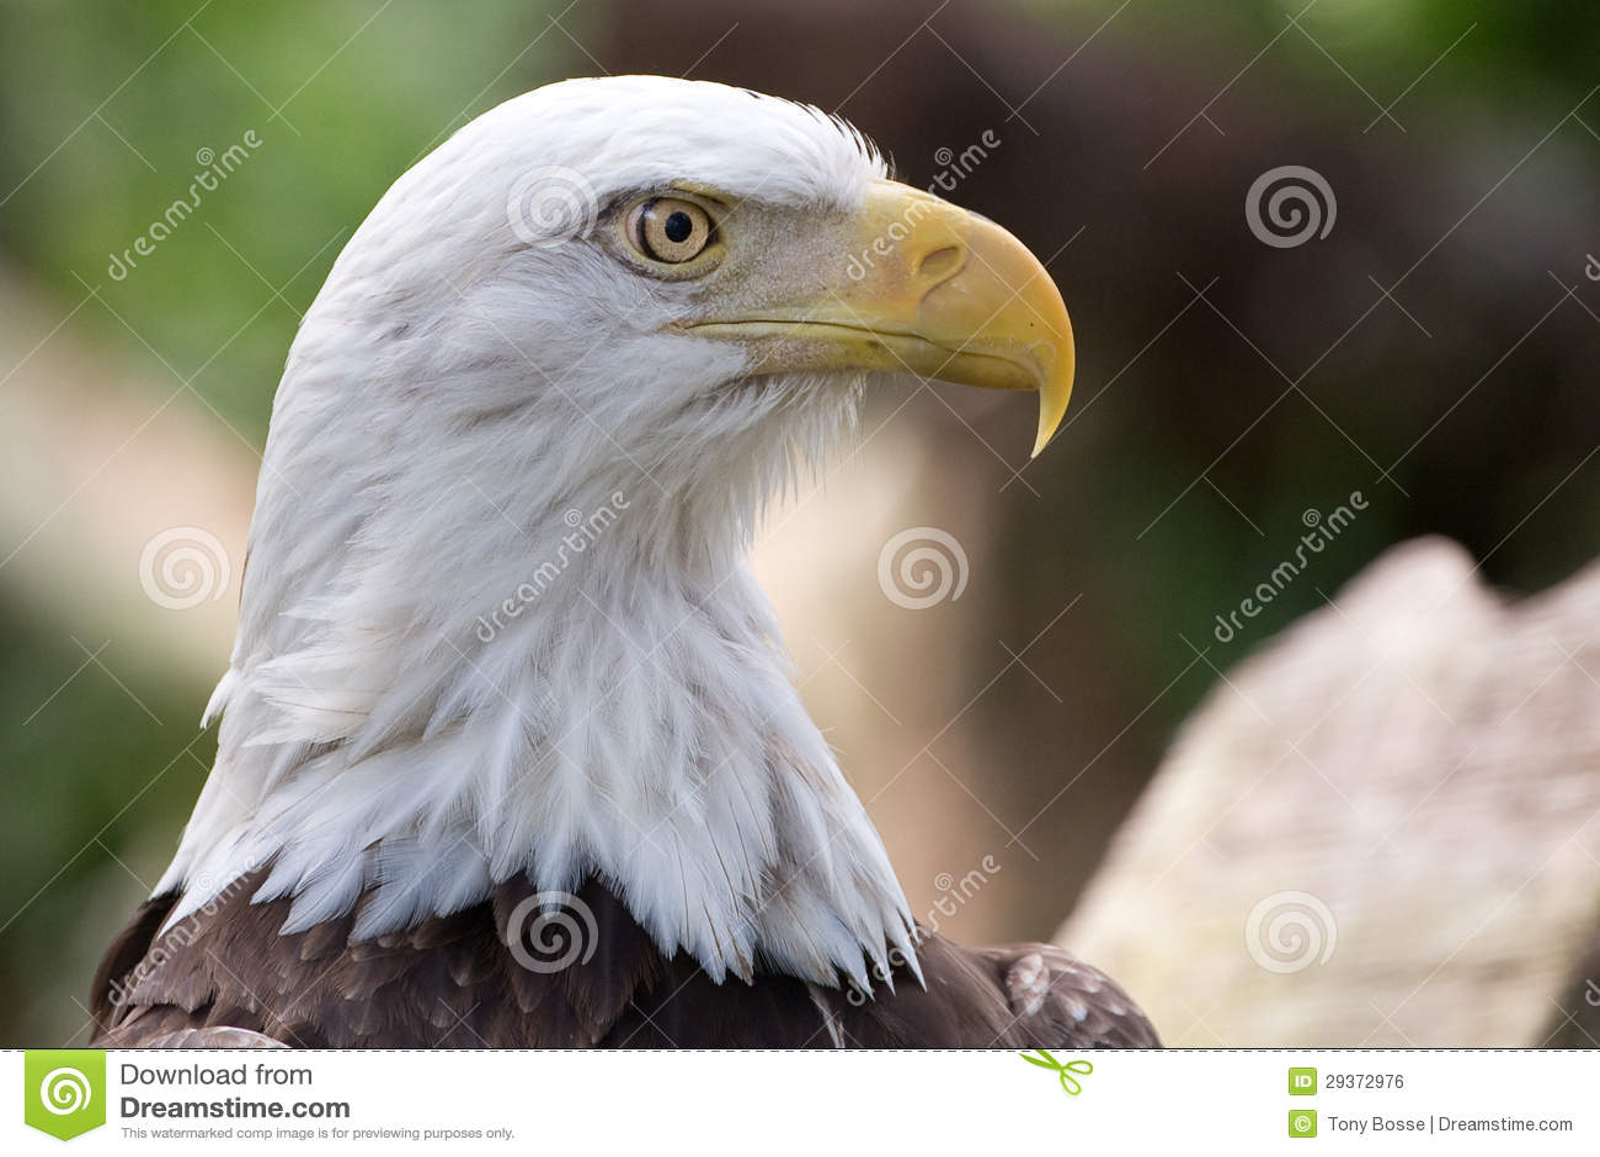 Bald eagle head front - photo#27